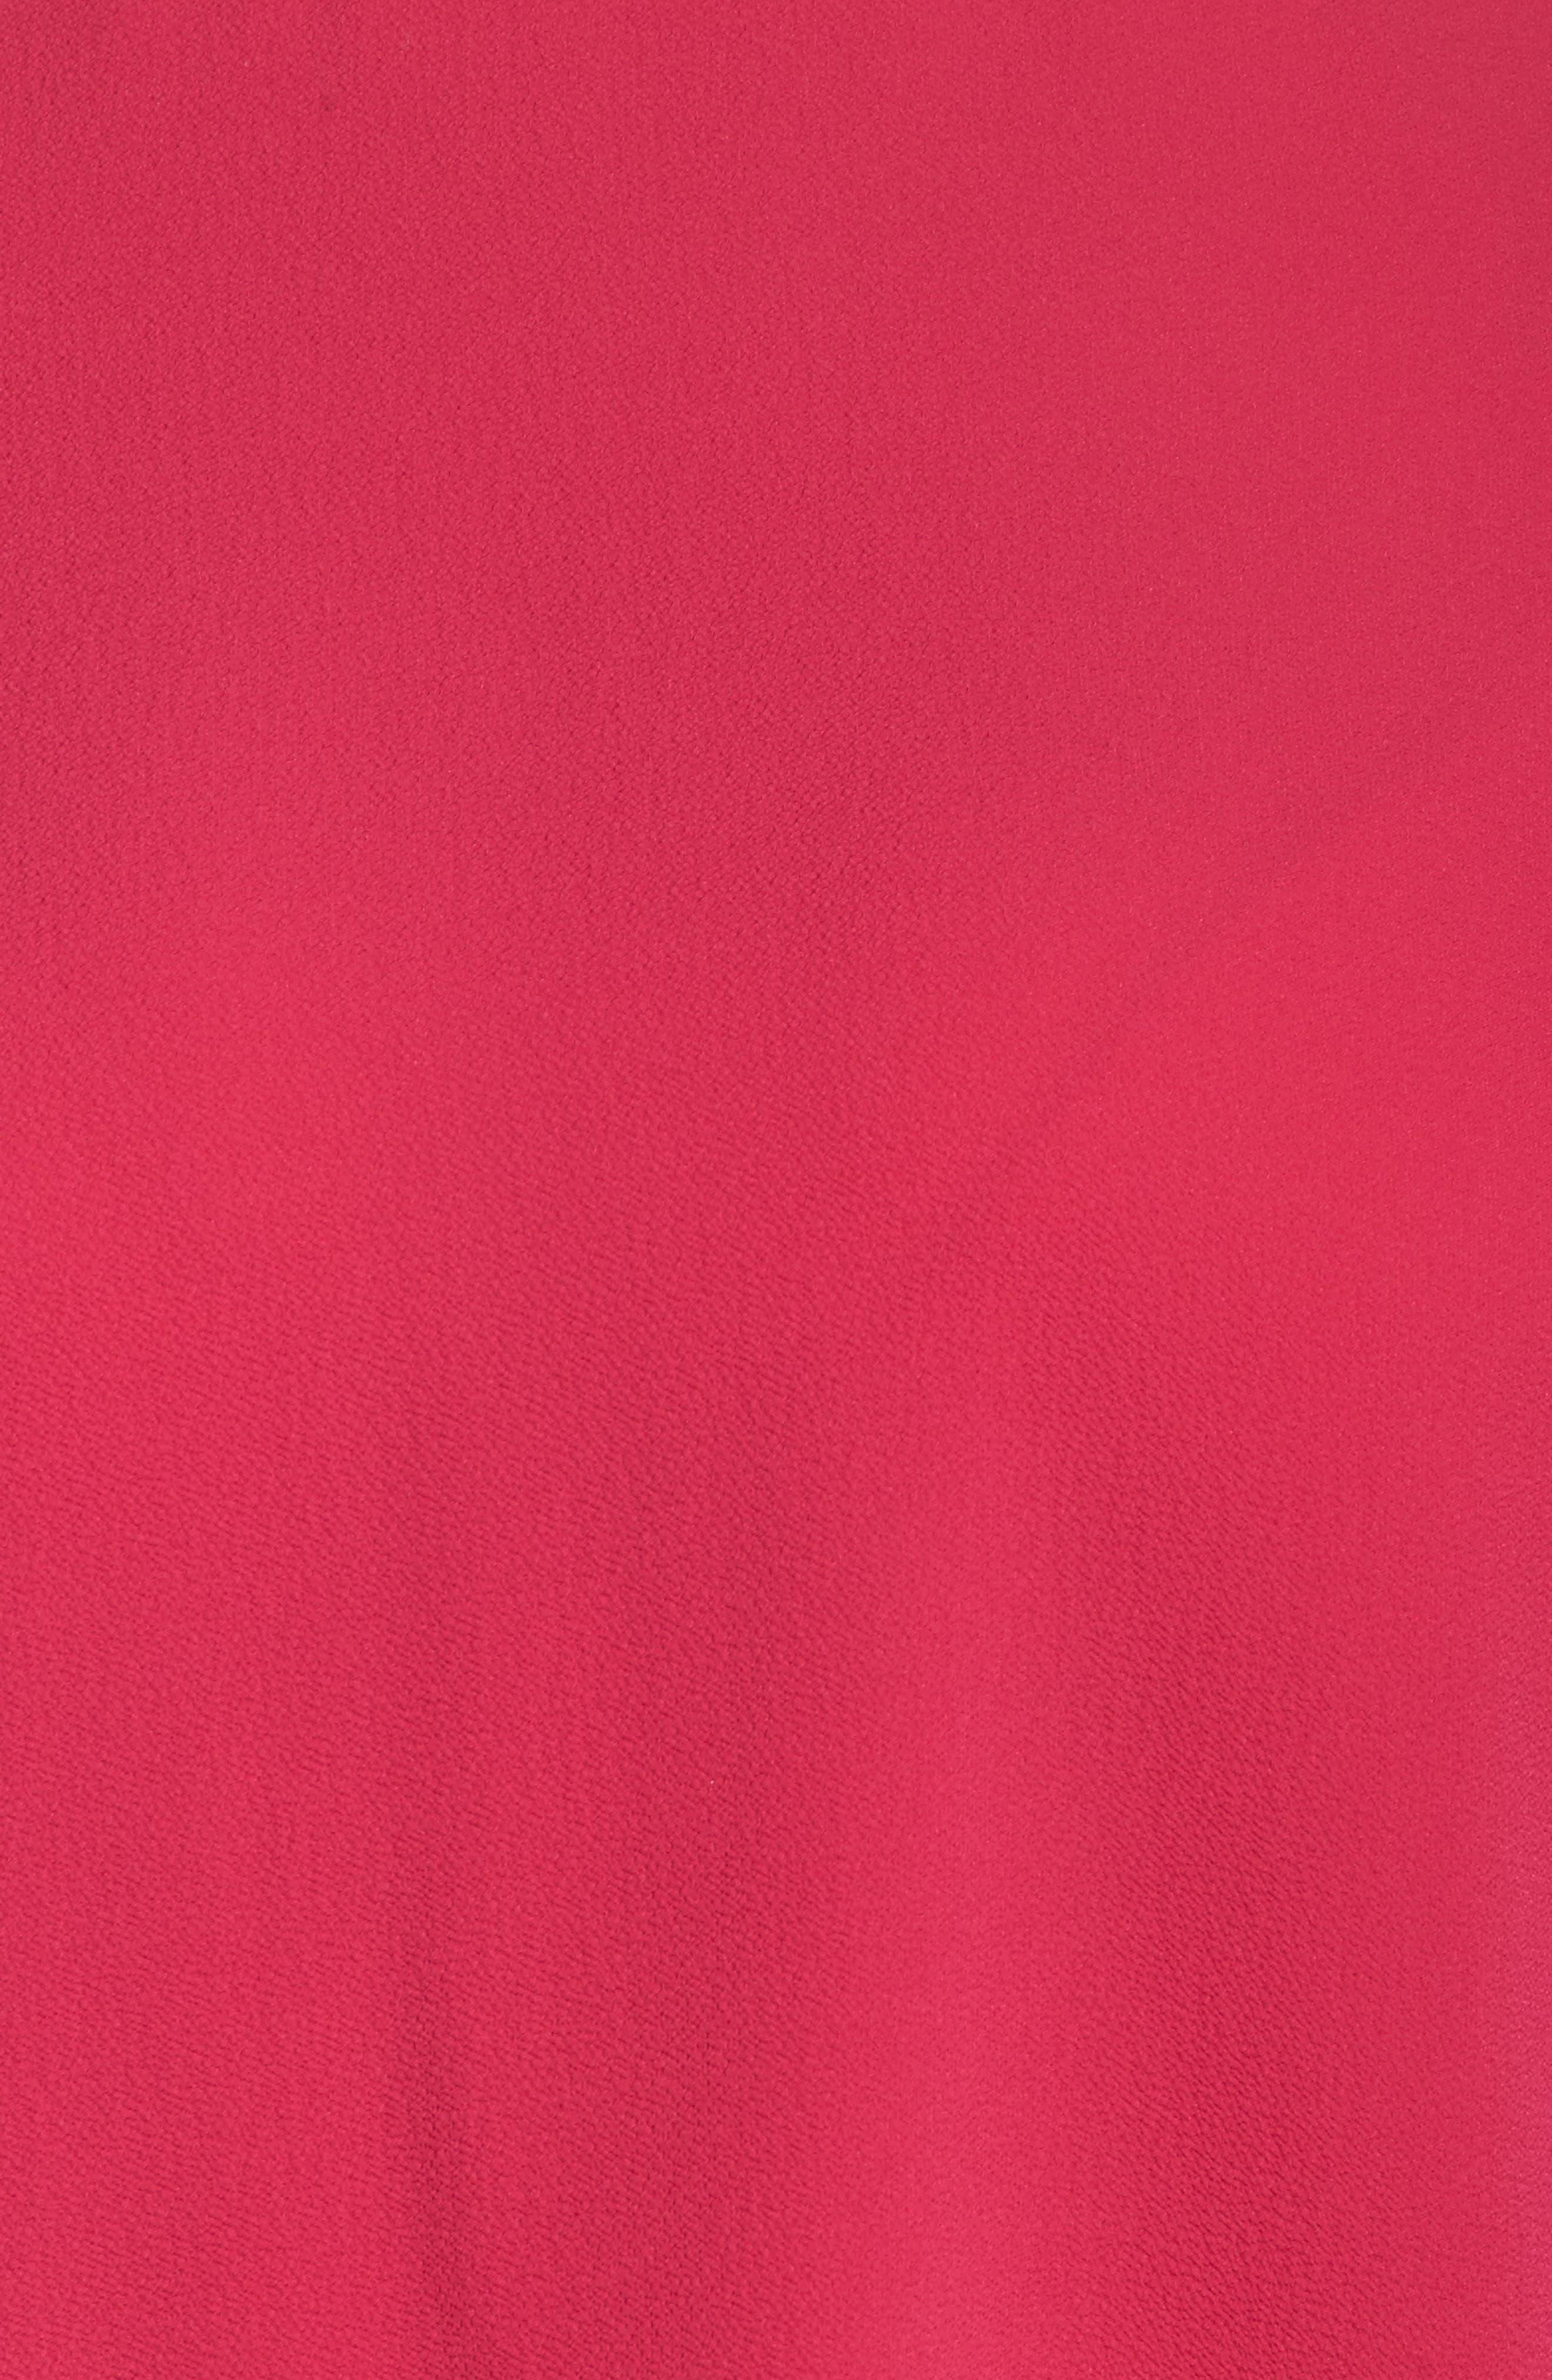 Alternate Image 5  - Vince Camuto Handkerchief Sleeve Blouse (Plus Size)